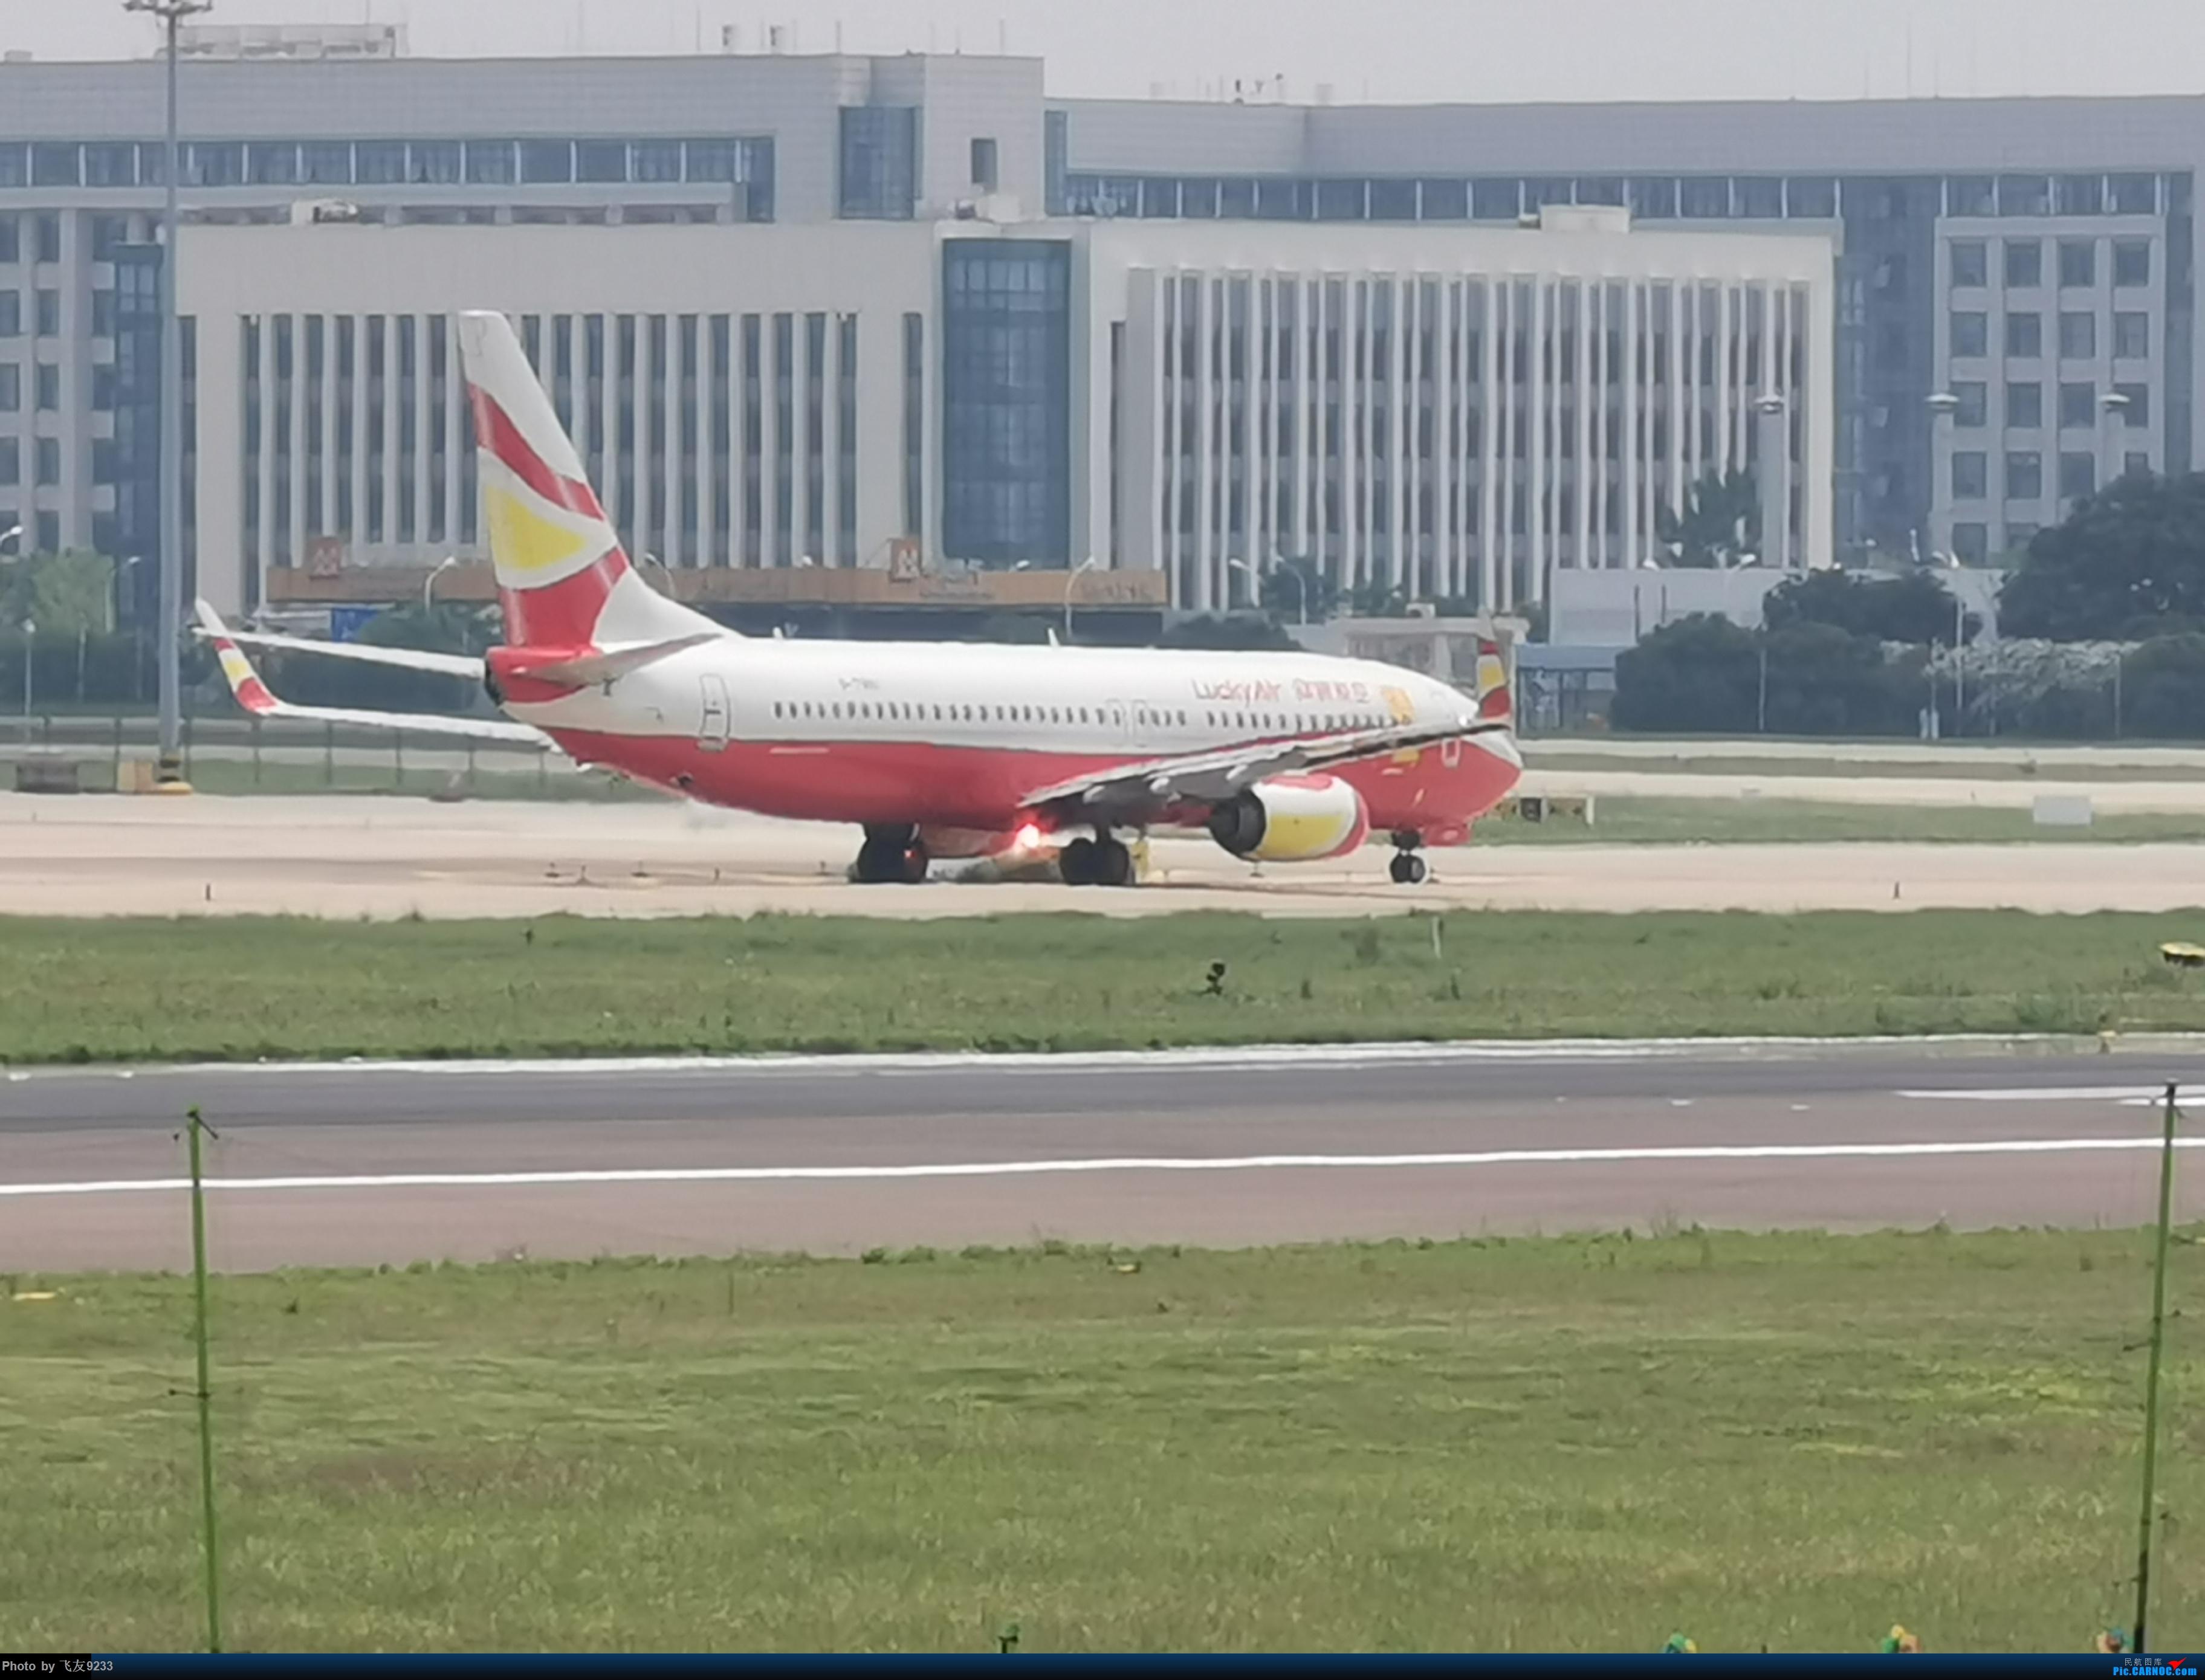 Re:[原创]武汉天河拍机之旅 BOEING 737-800 B-7991 中国武汉天河国际机场